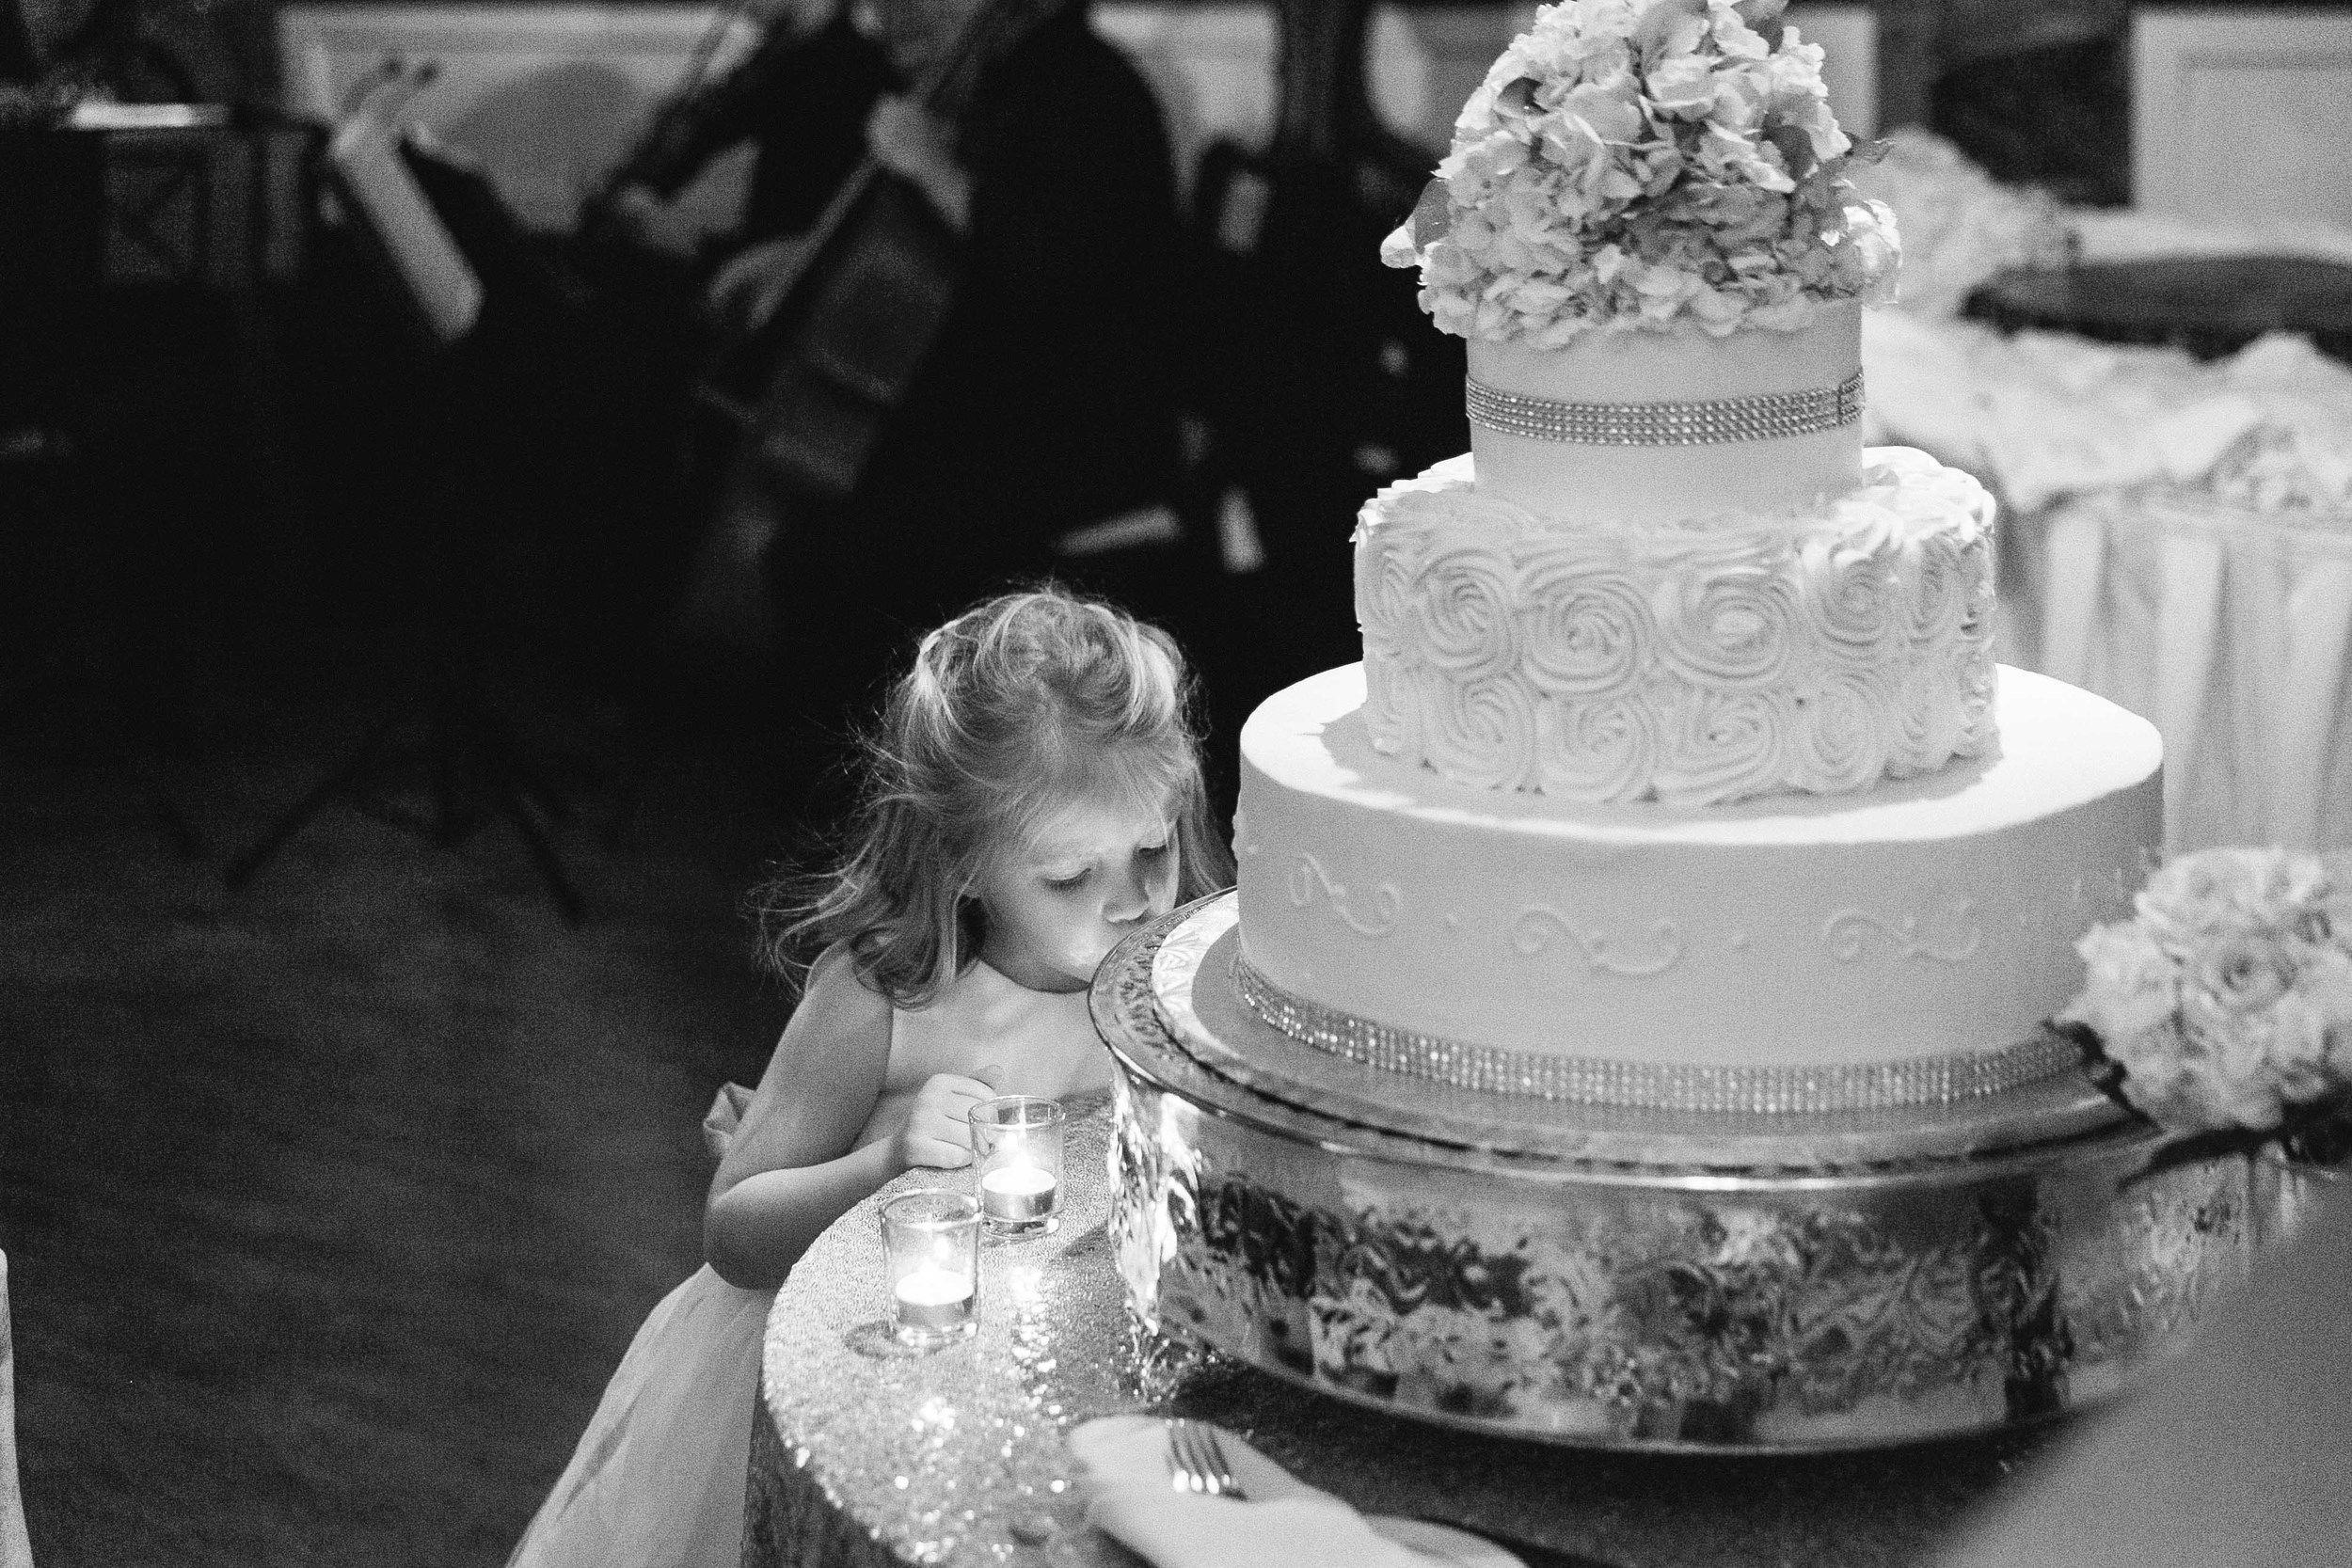 New-Years-Eve-Pond-House-Cafe-West-Hartford-Connecticut-Wedding-Jacek-Dolata-Photography-11.jpg